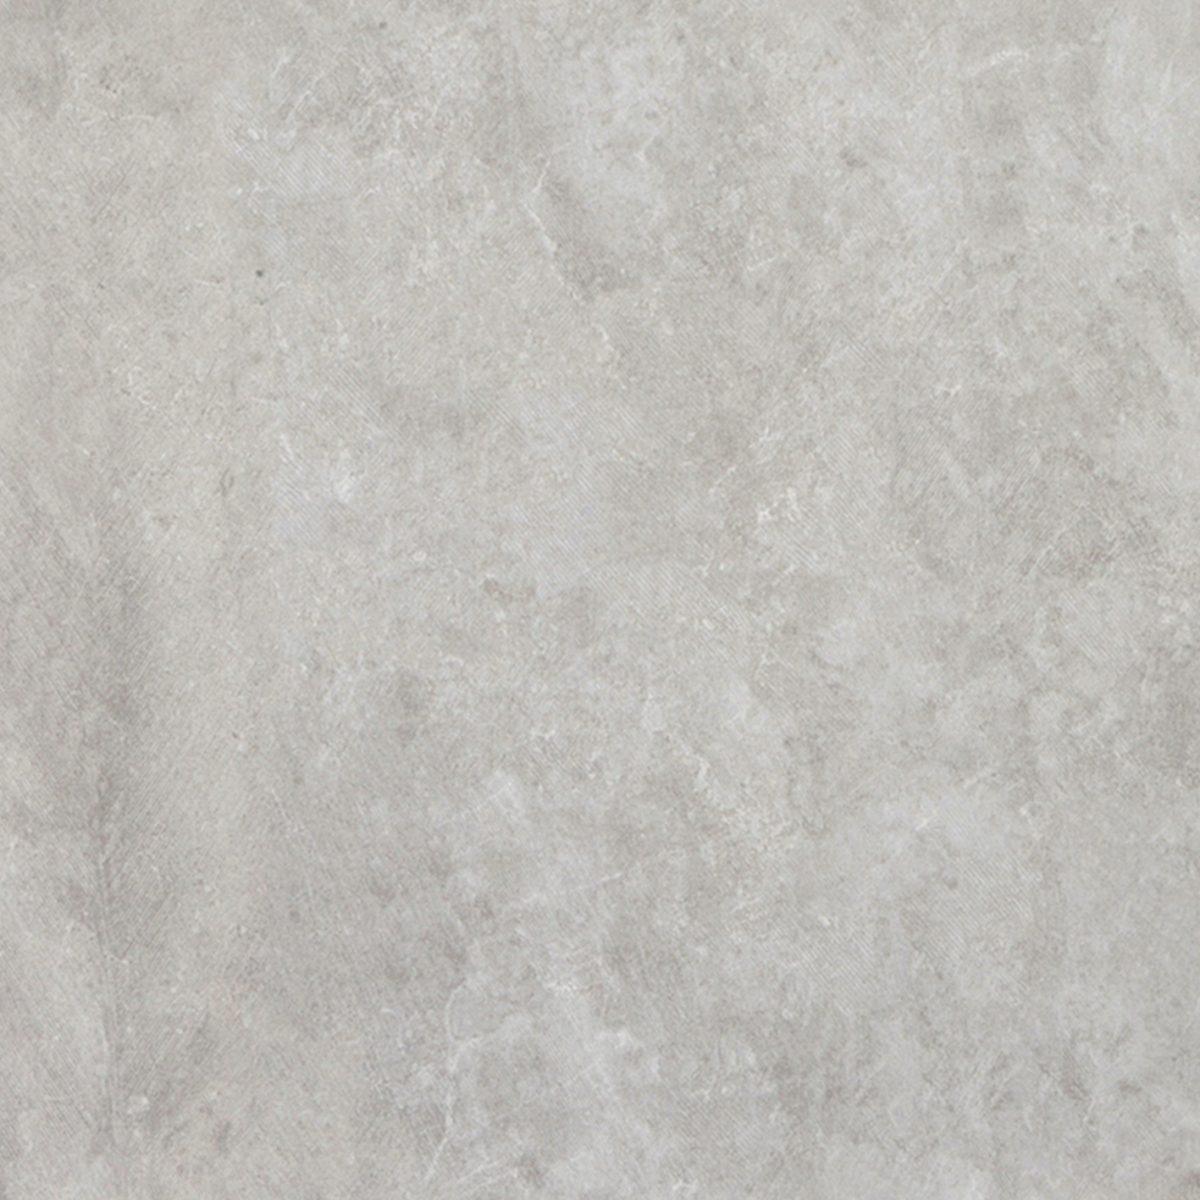 Porcelanosa Rodano Acero Tile 120 x 120 cm